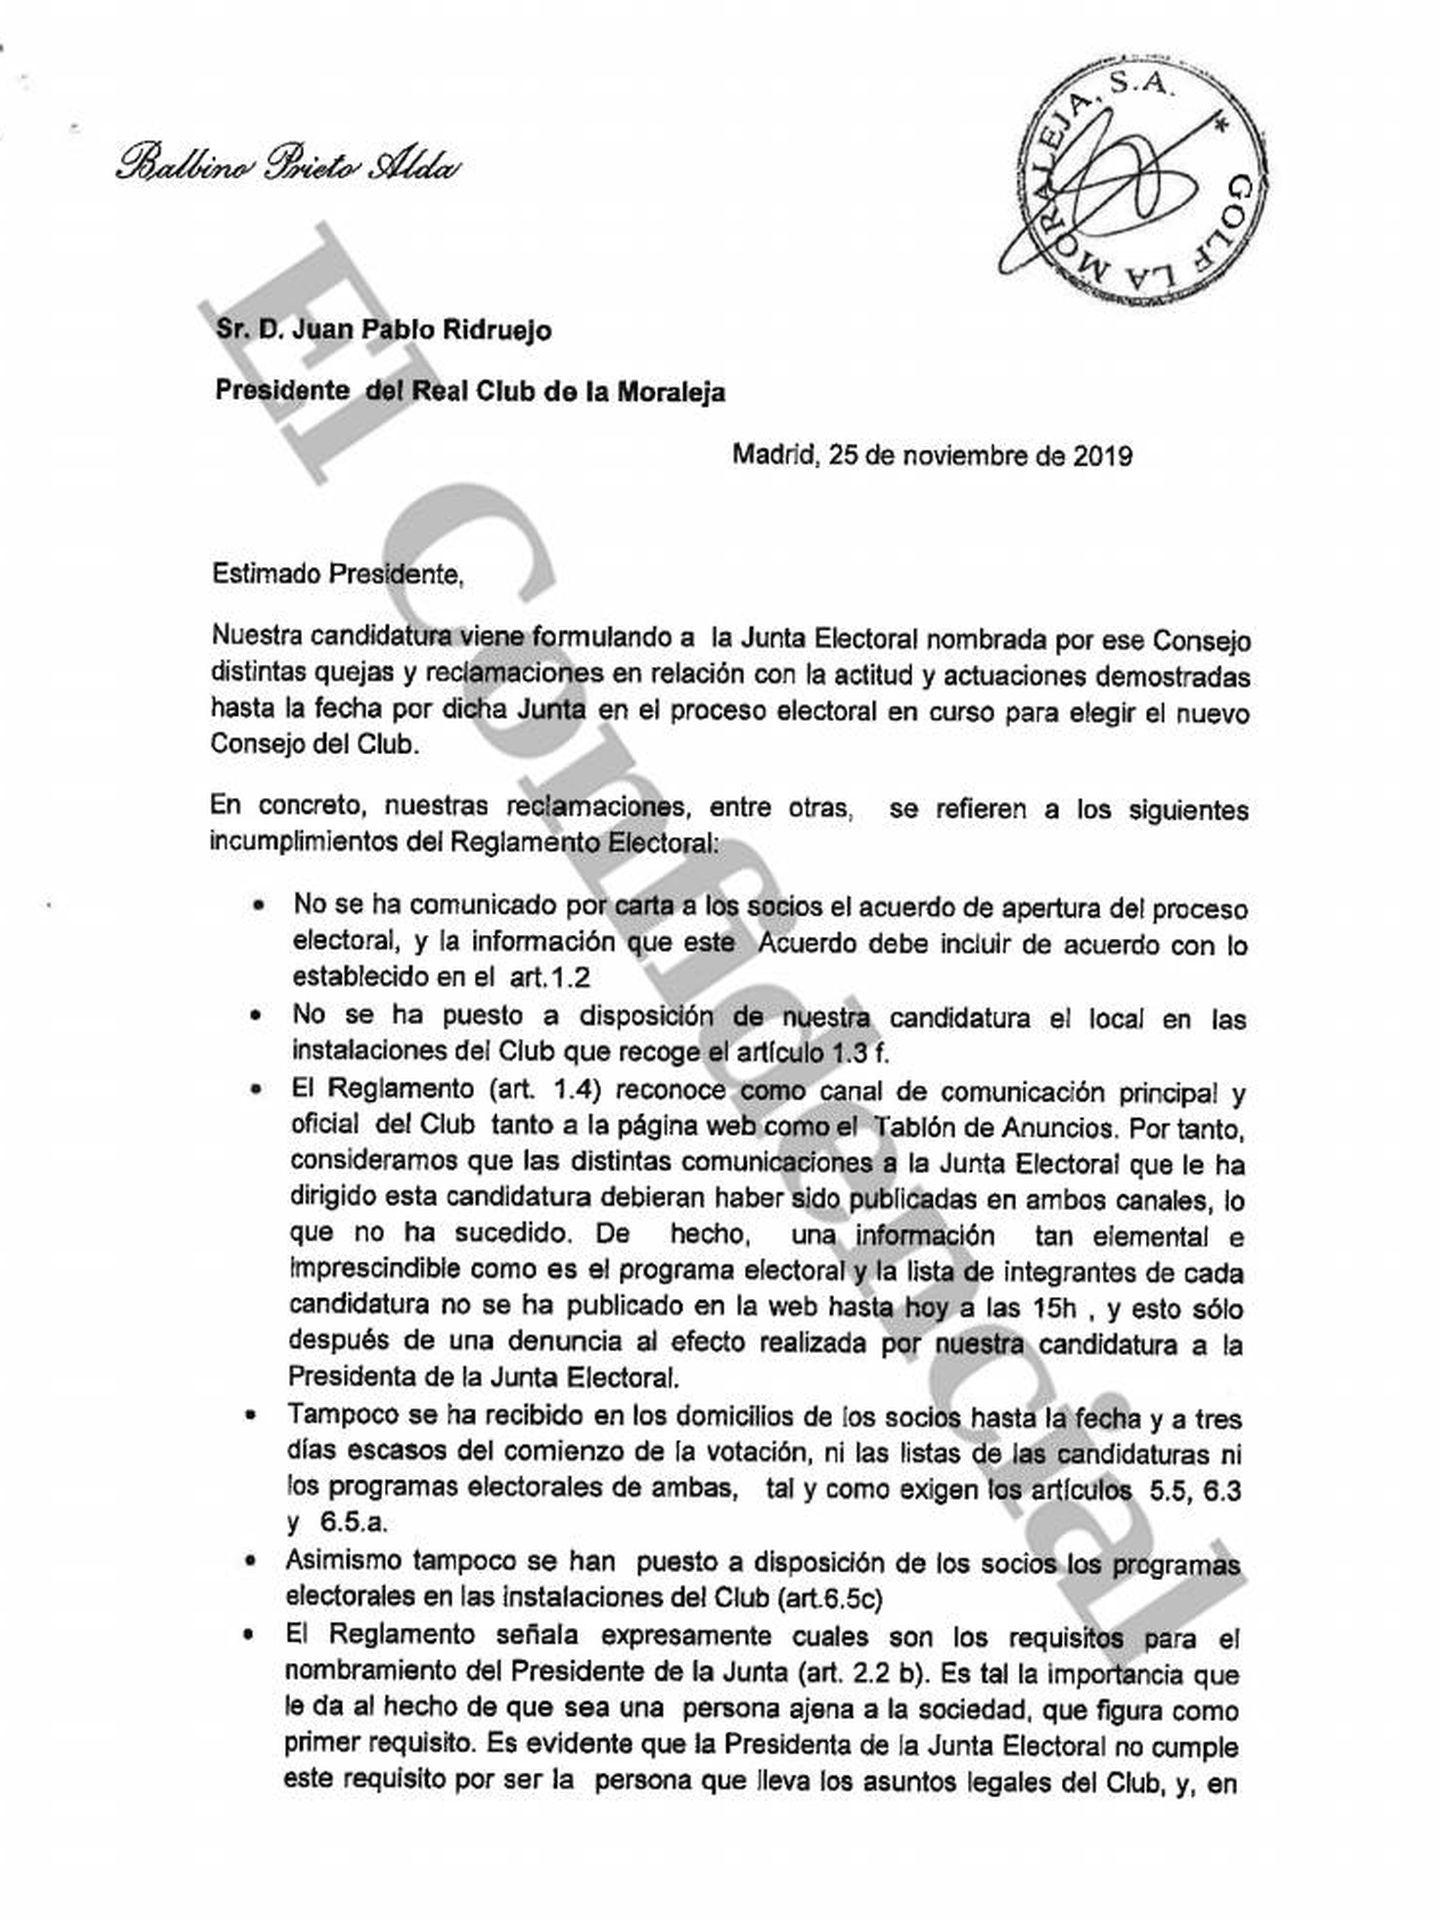 Carta enviada por Balbino Prieto al presidente y candidato, Juan Pablo Ridruejo. (EC)